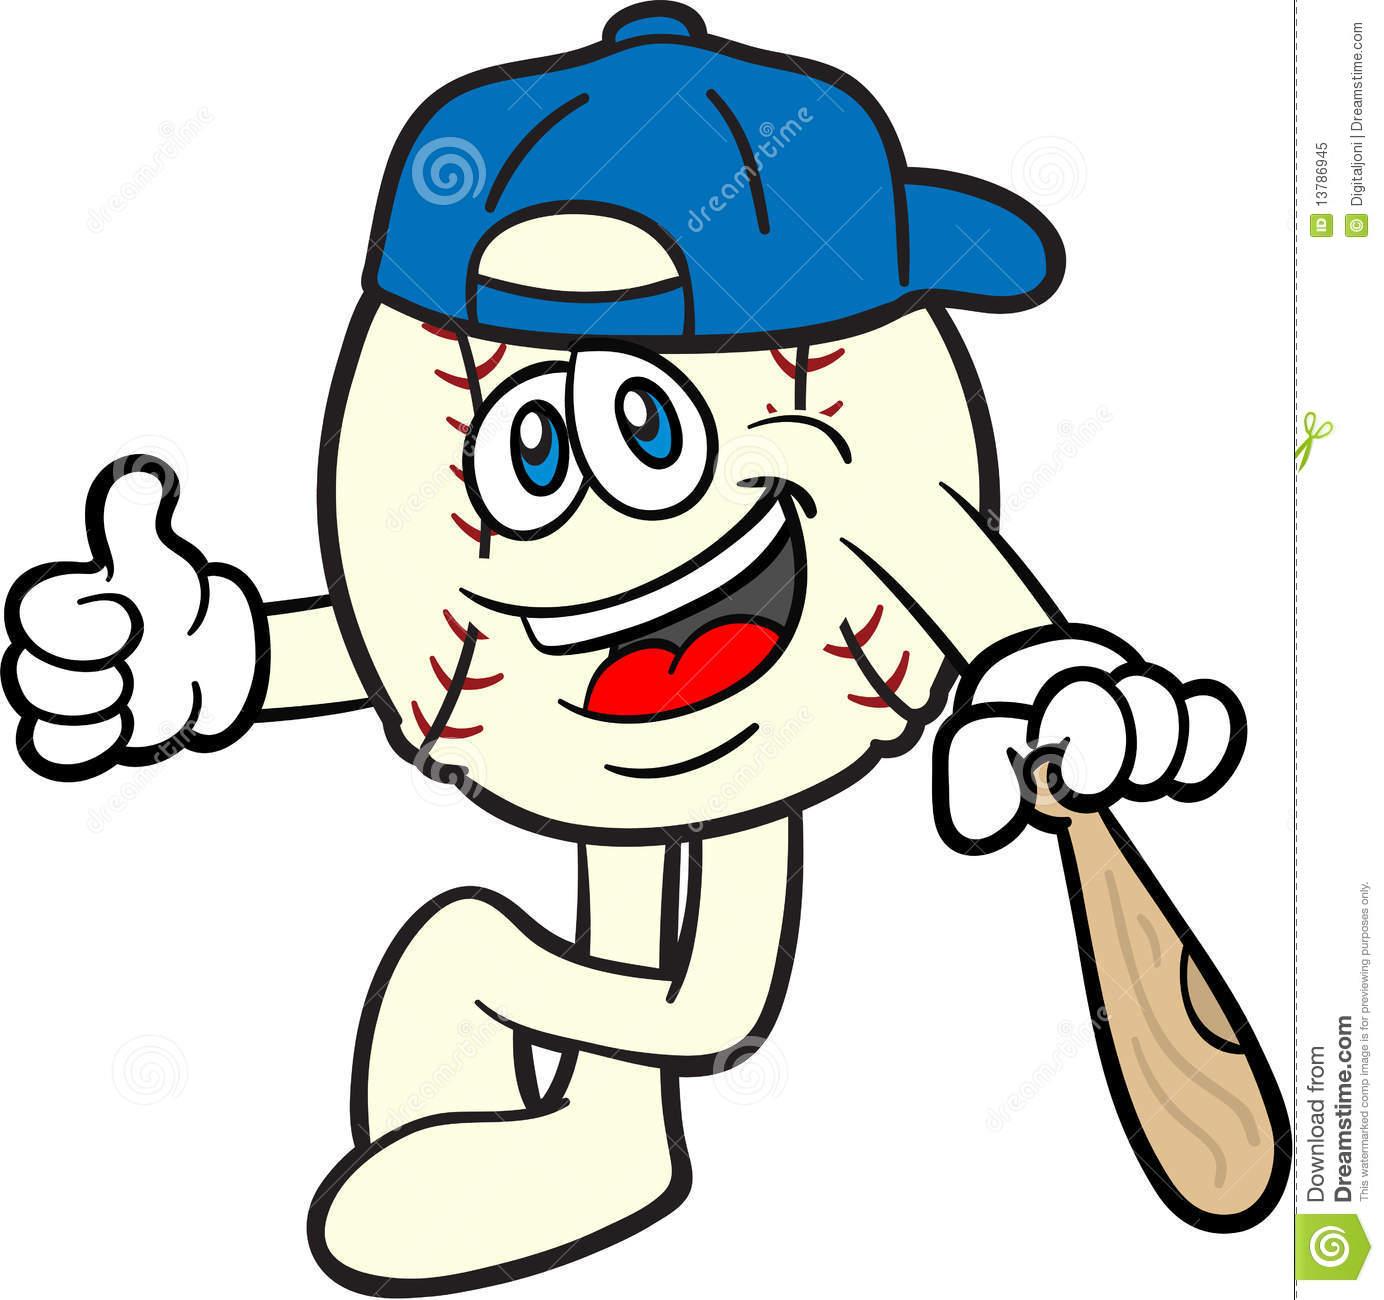 40 Lowest Baseball Cartoon Image.